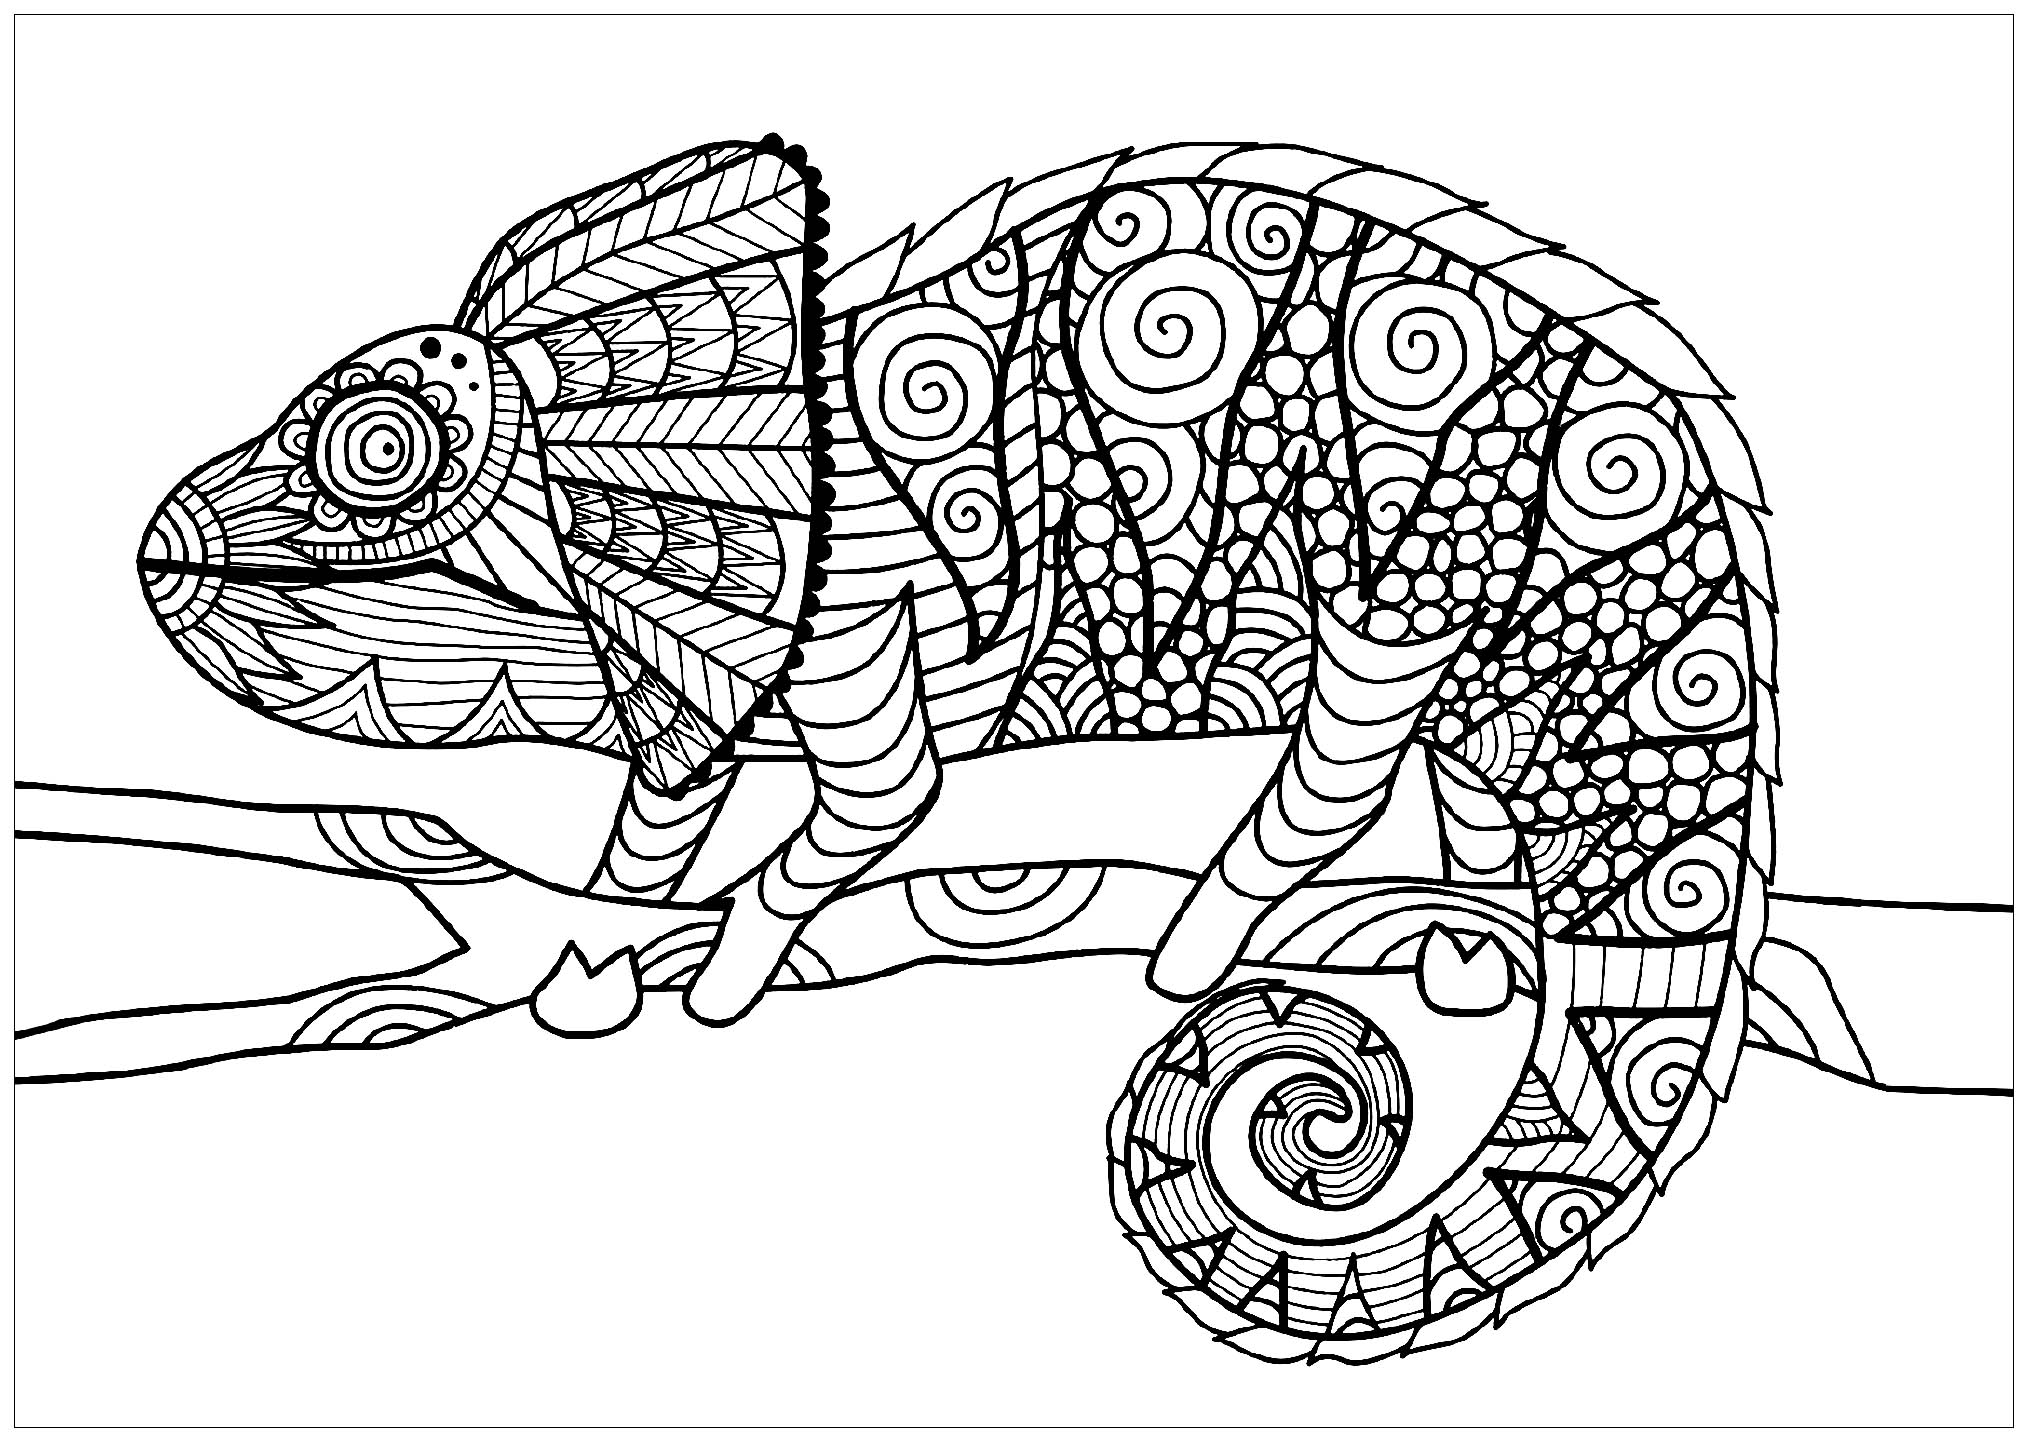 Camaleones y lagartos 51704 - Camaleones Y Lagartos ...